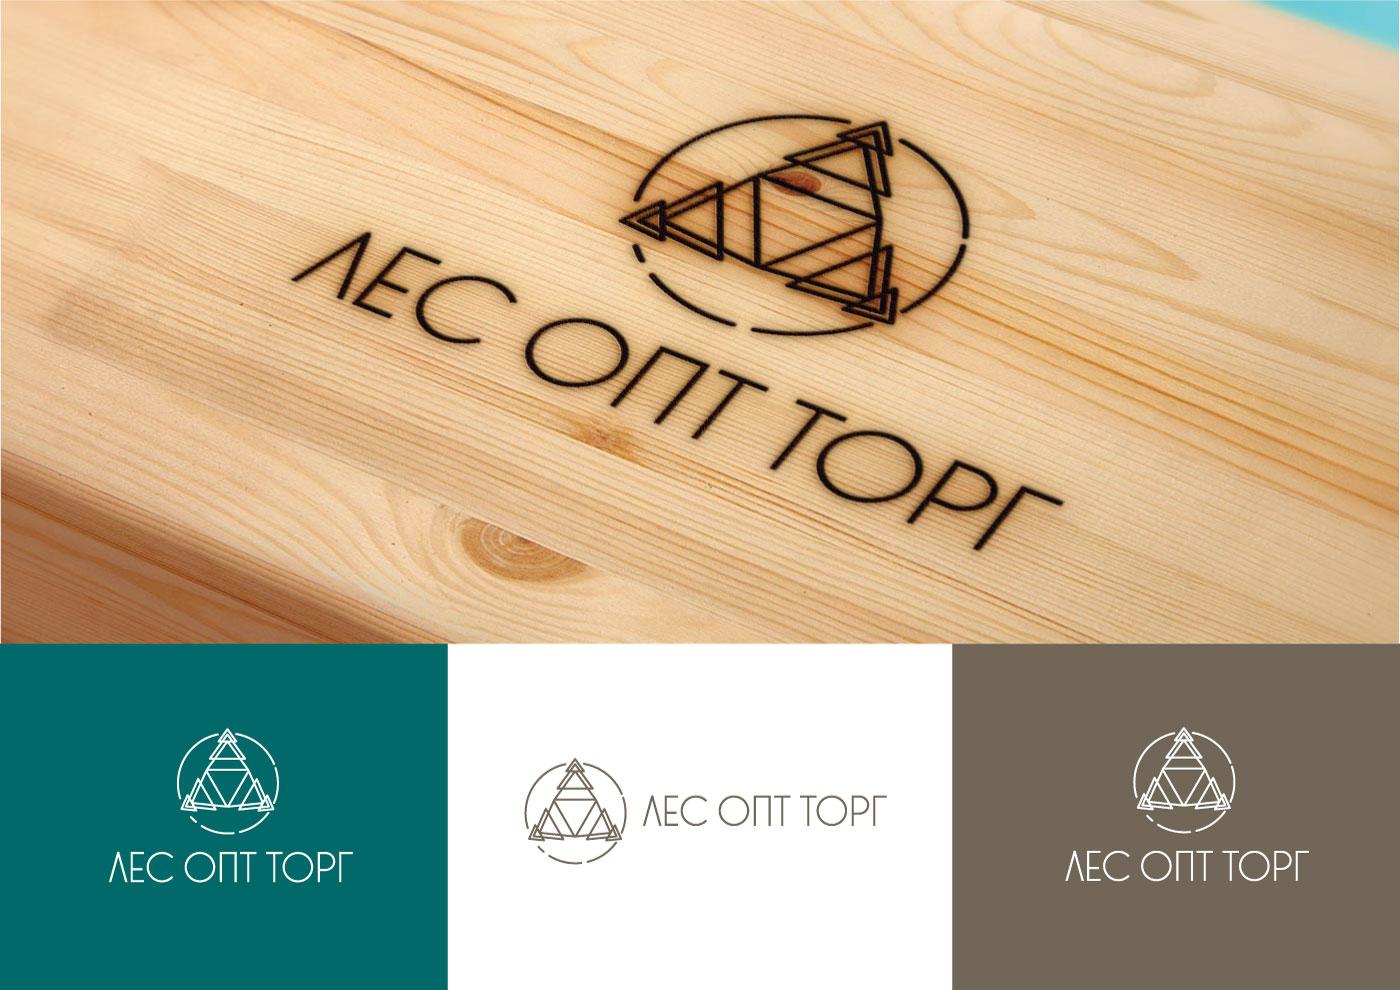 Crearea LesOptTorg logo-